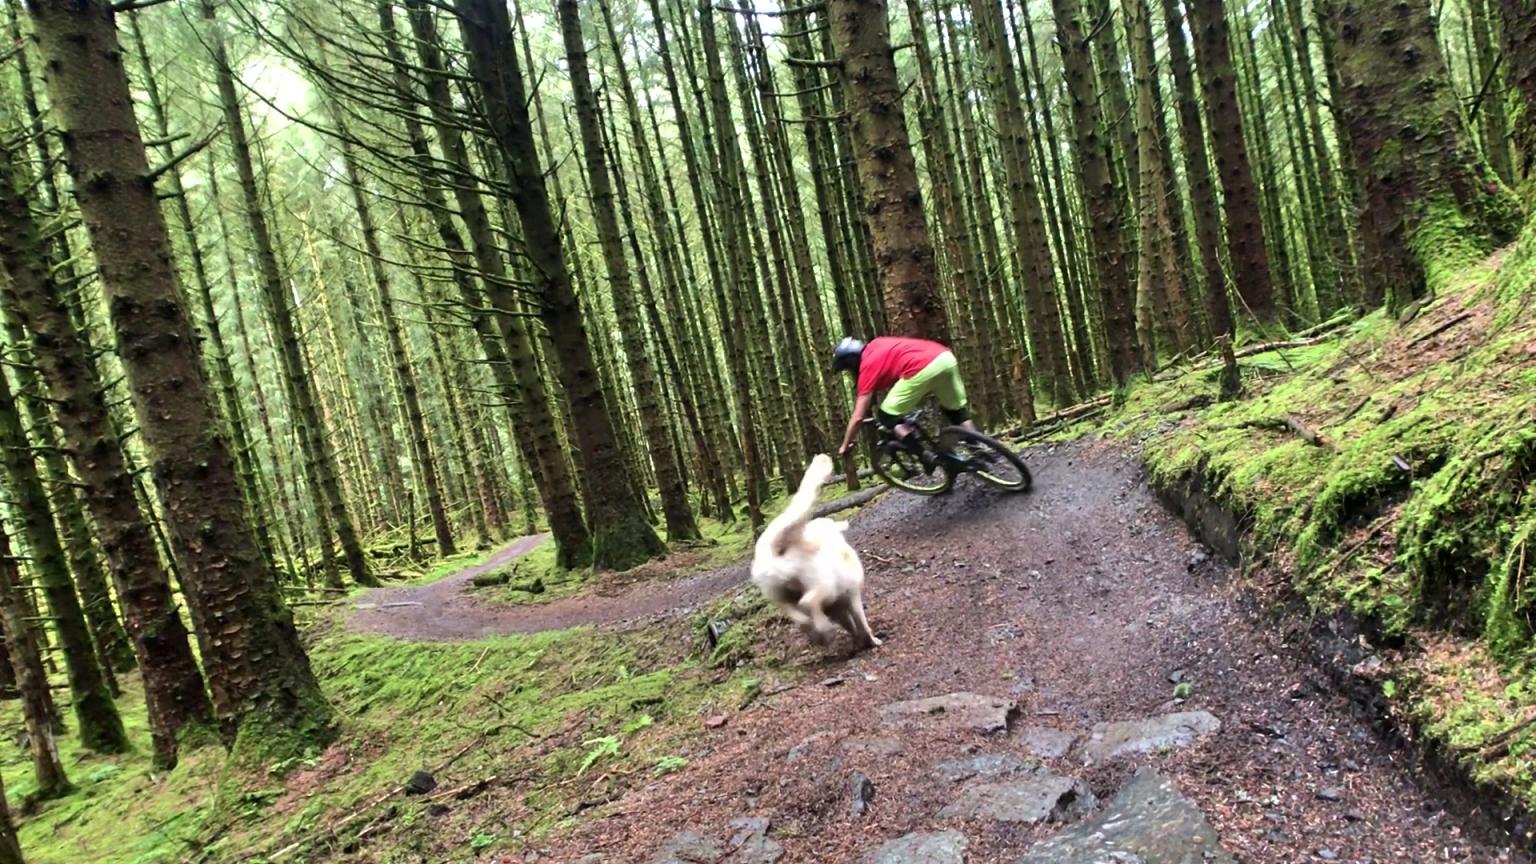 ni_explorer_davagh_forest_mountain_biking_northern_ireland (3).jpg